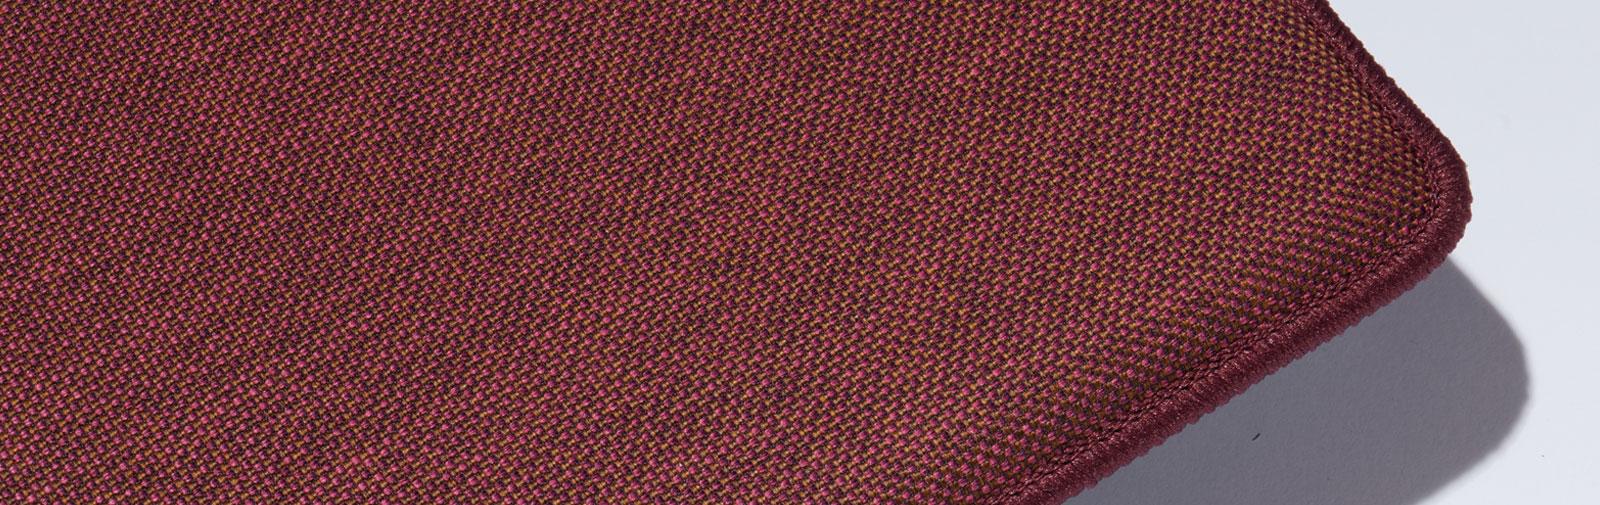 coussin Bankauflage Verano code couleur 662 couleur pourpre